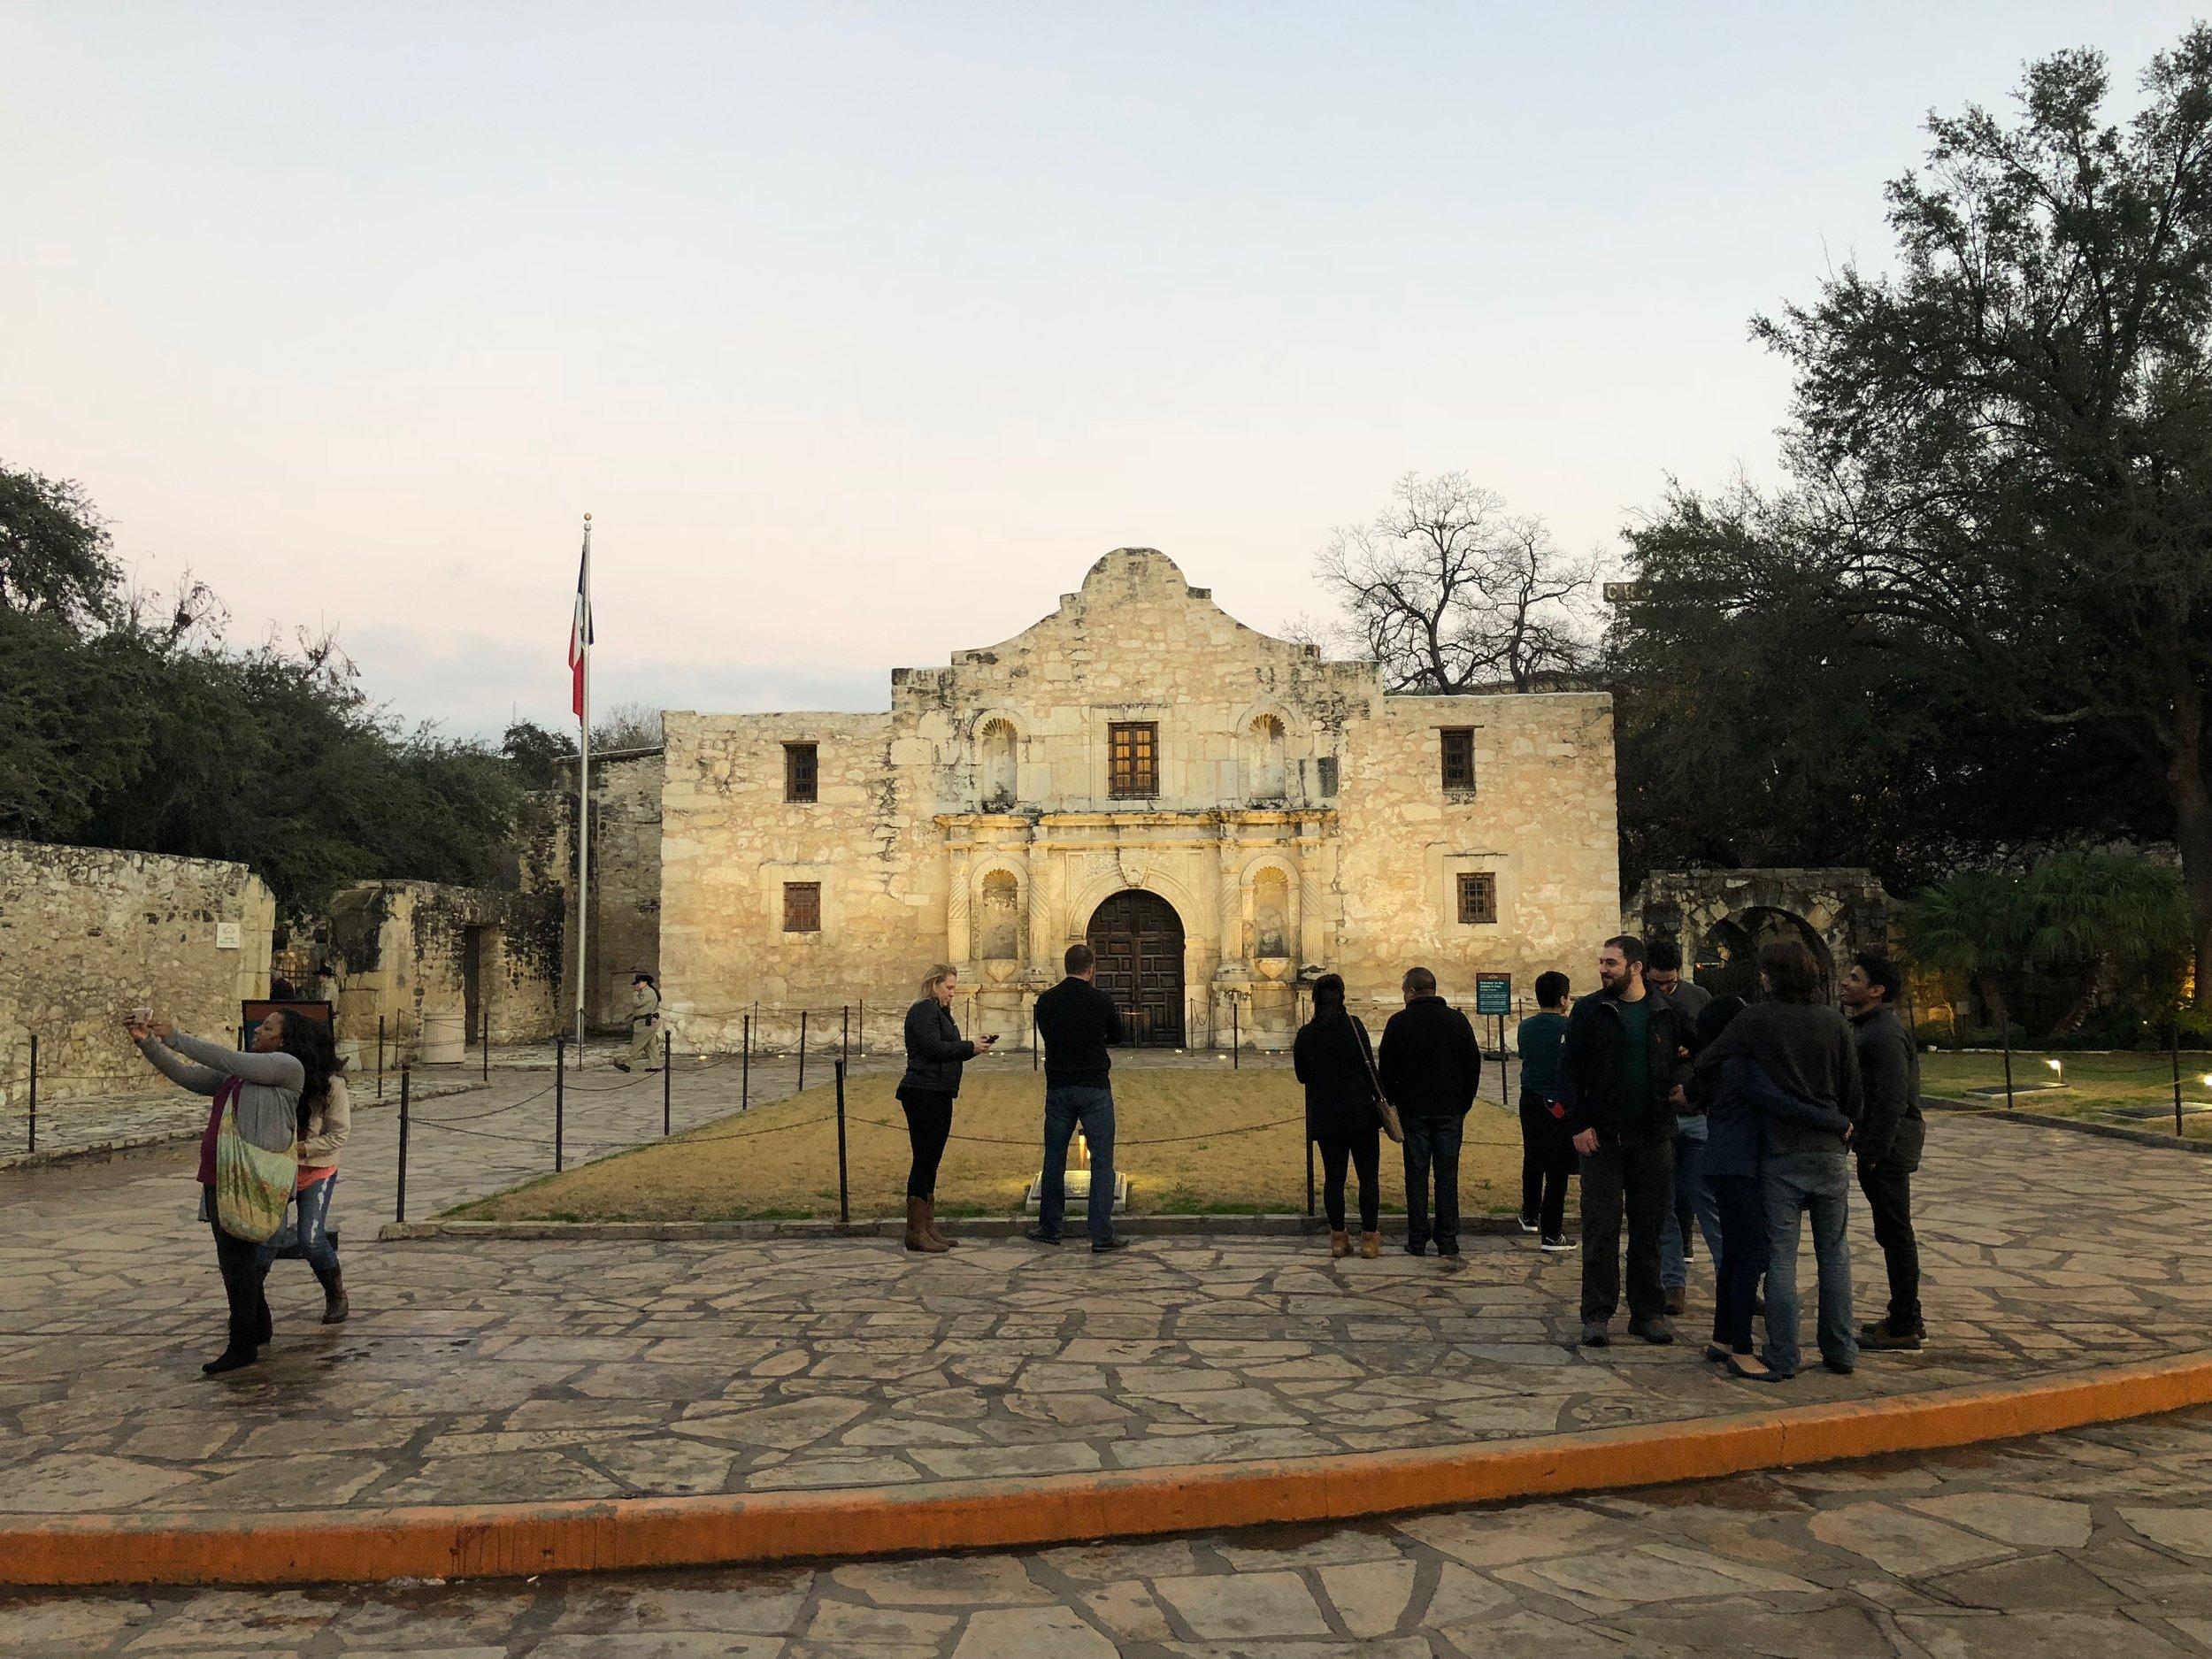 Festive Alamo atmosphere